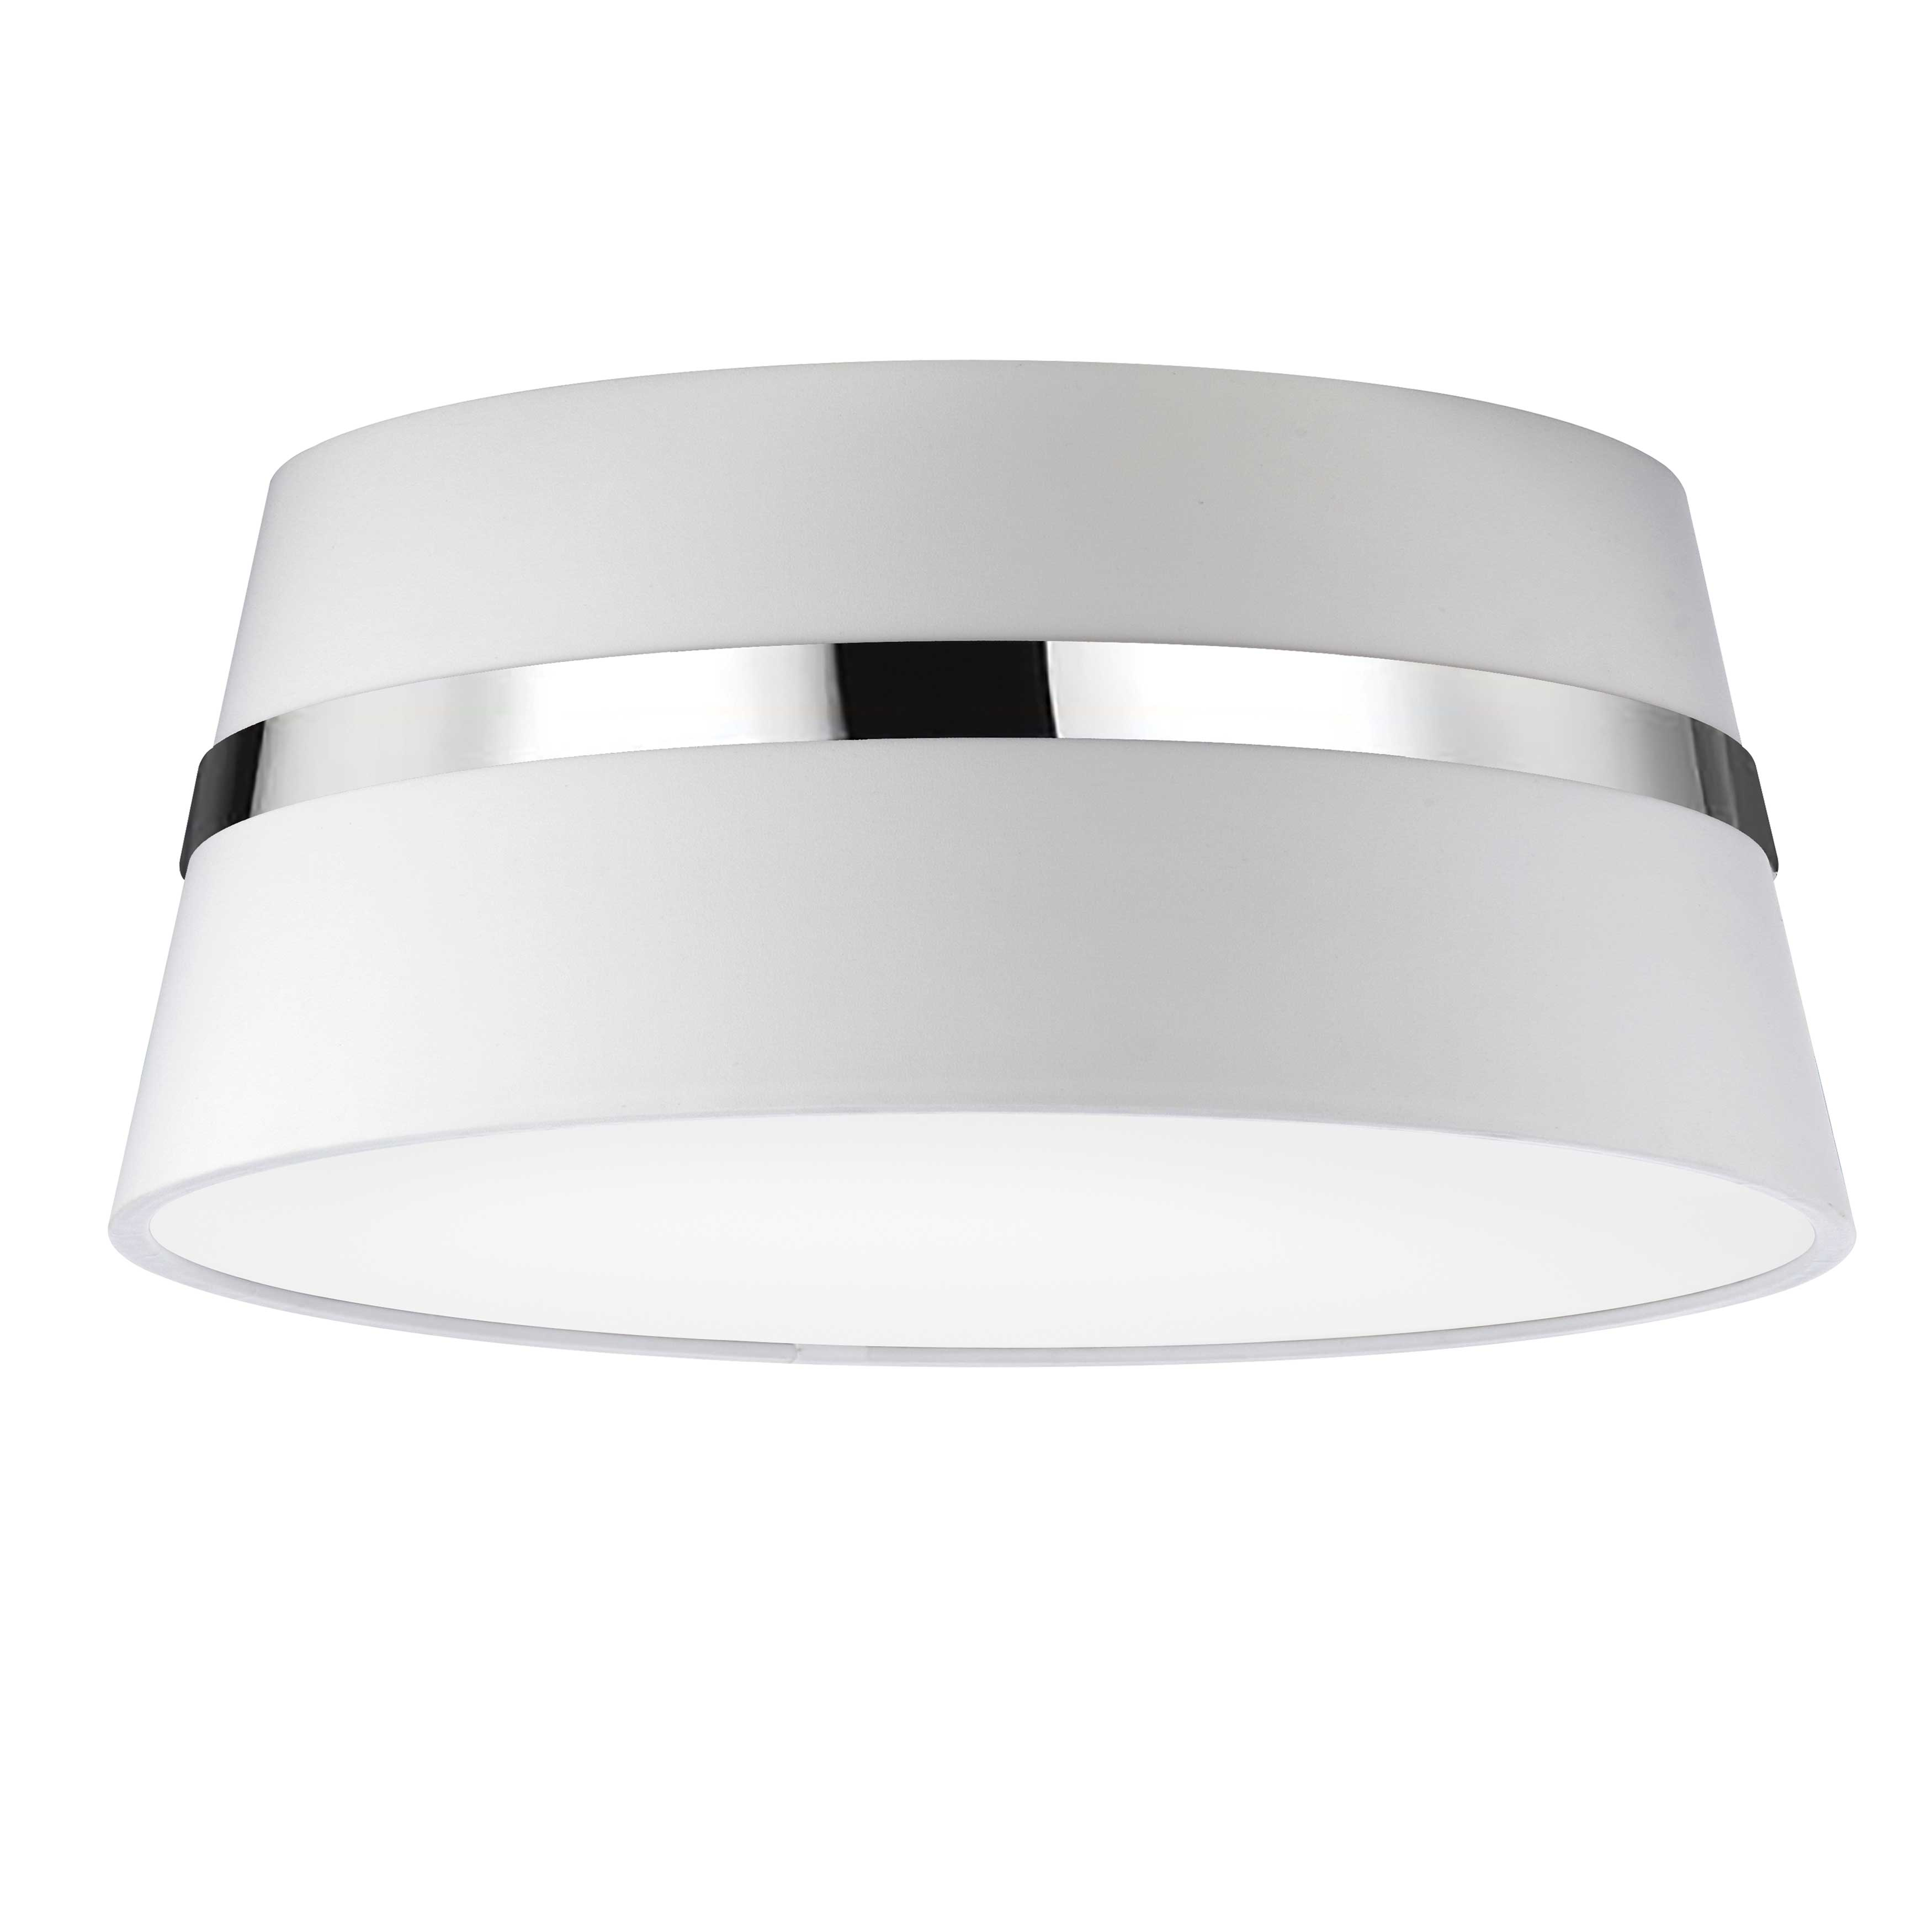 3 Light Incandescent Polished Chrome Semi-Flush Mount w/ White Shade